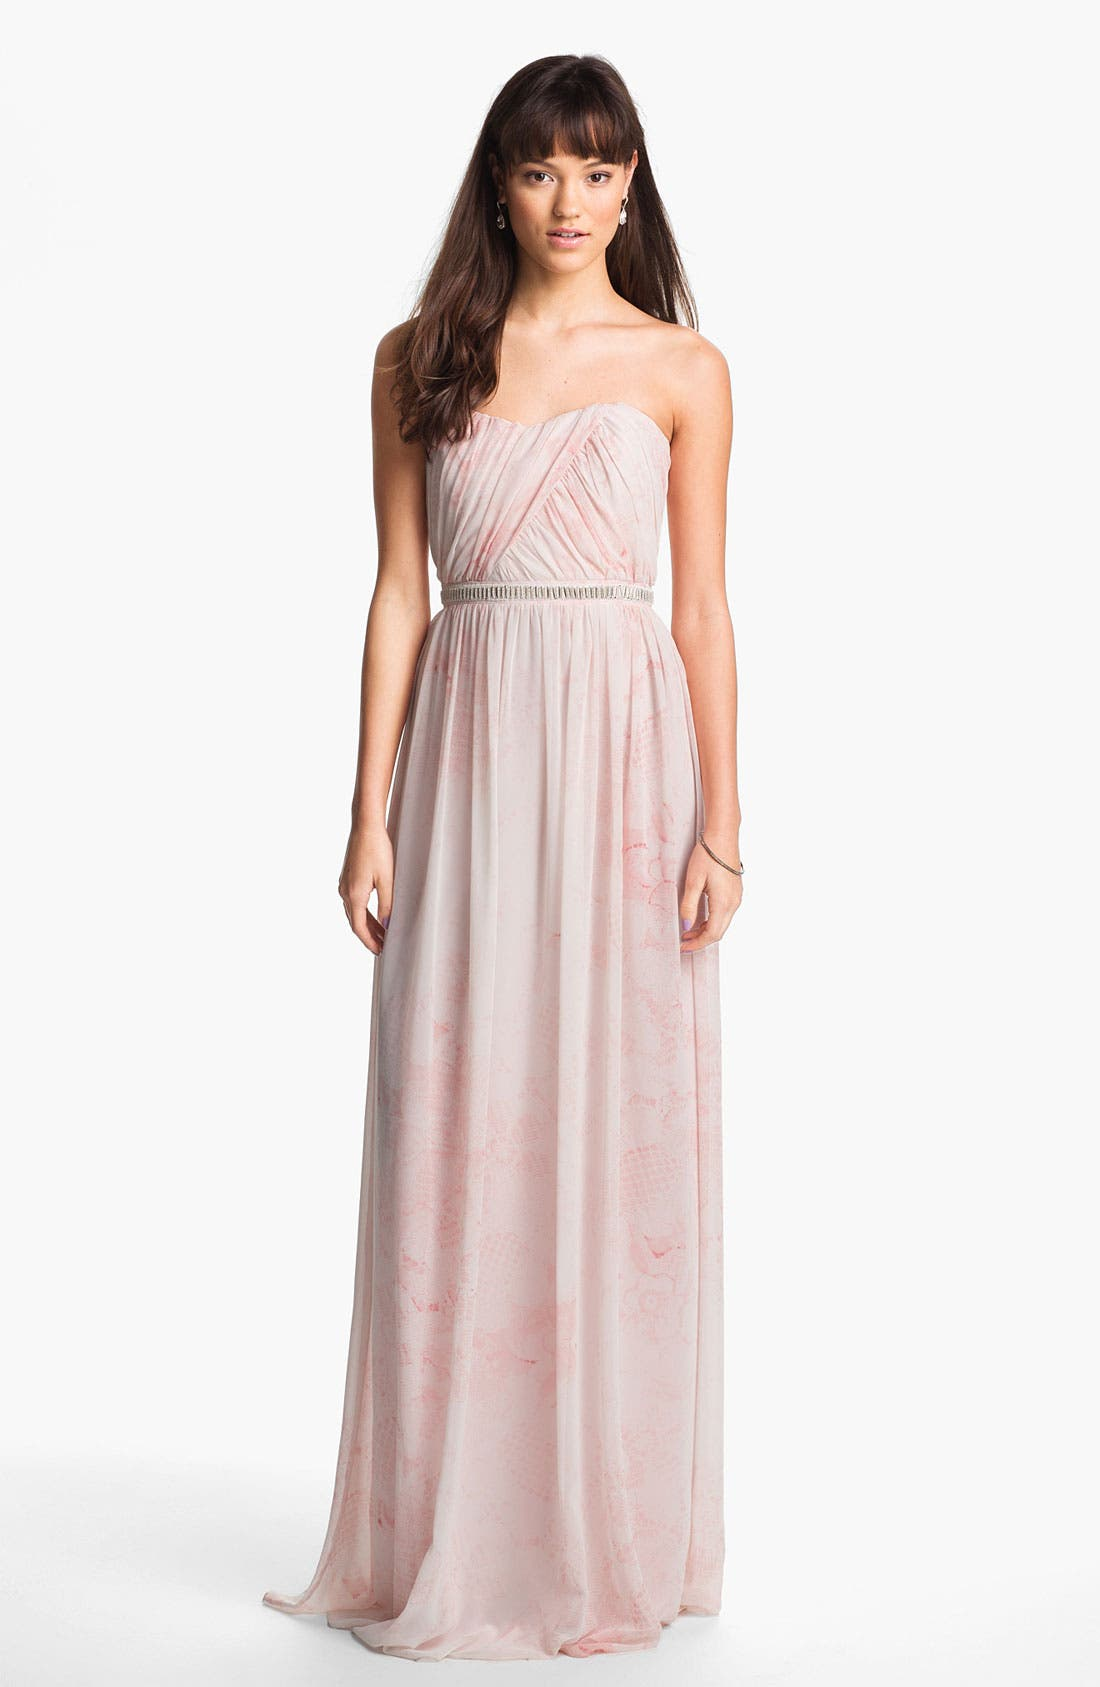 Main Image - ERIN erin fetherston 'Cross Heart' Embellished Chiffon Gown